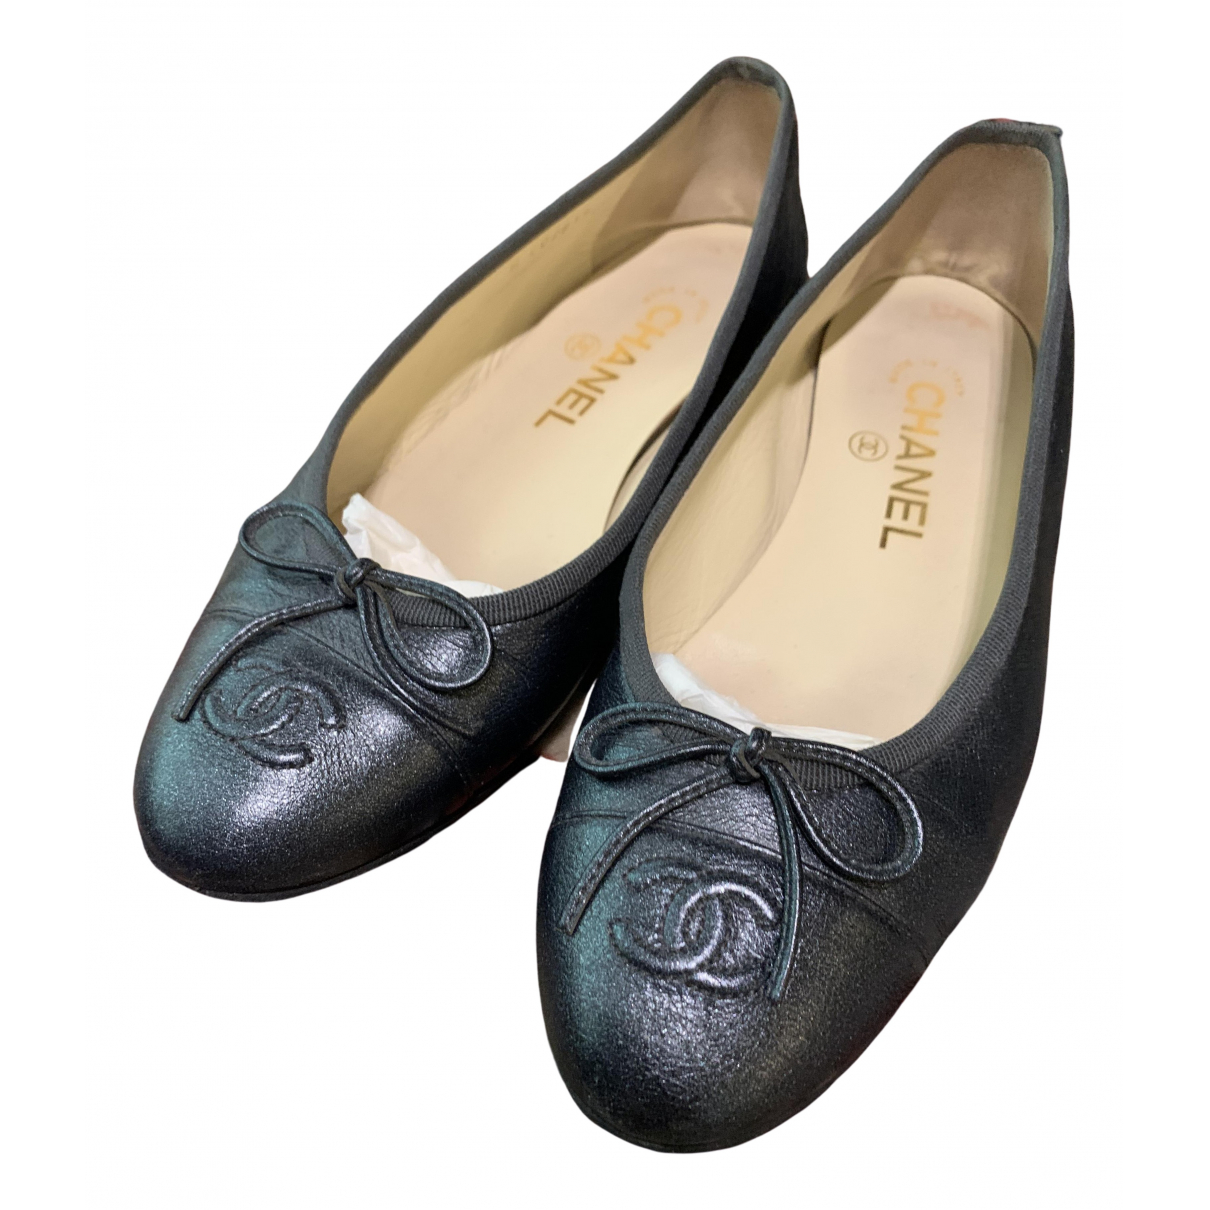 Chanel \N Blue Leather Ballet flats for Women 36.5 IT